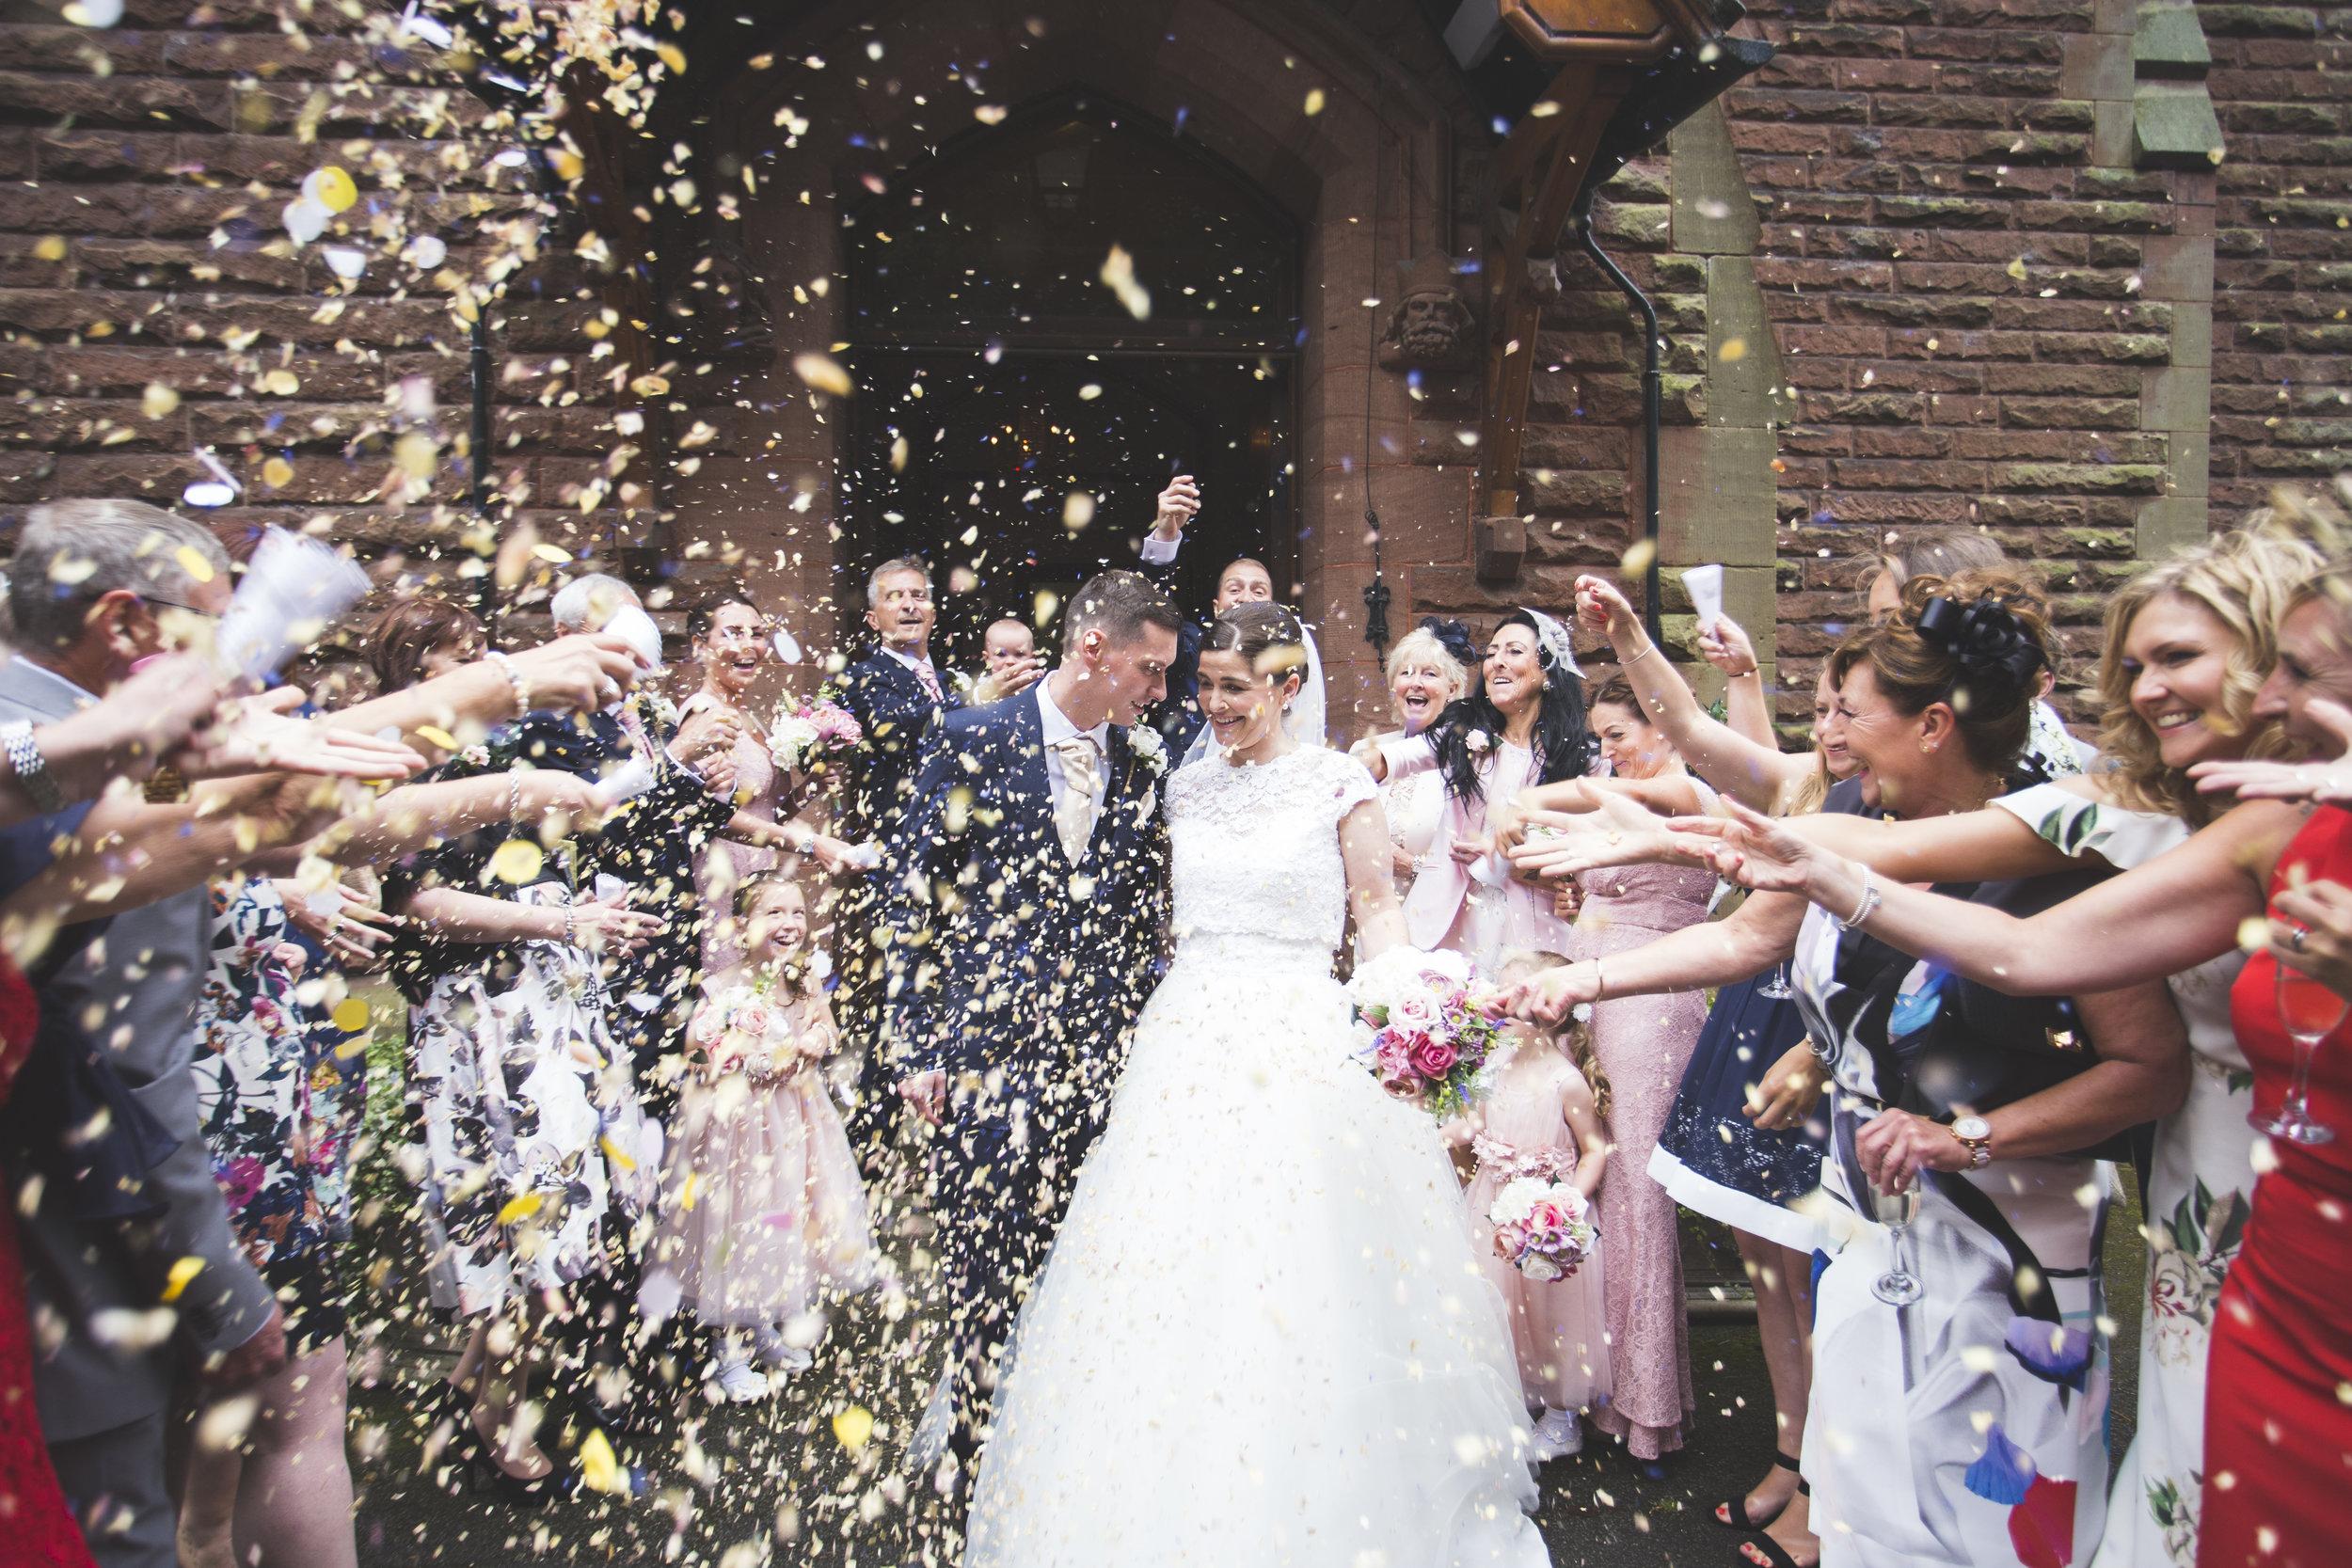 wedding7large.jpg